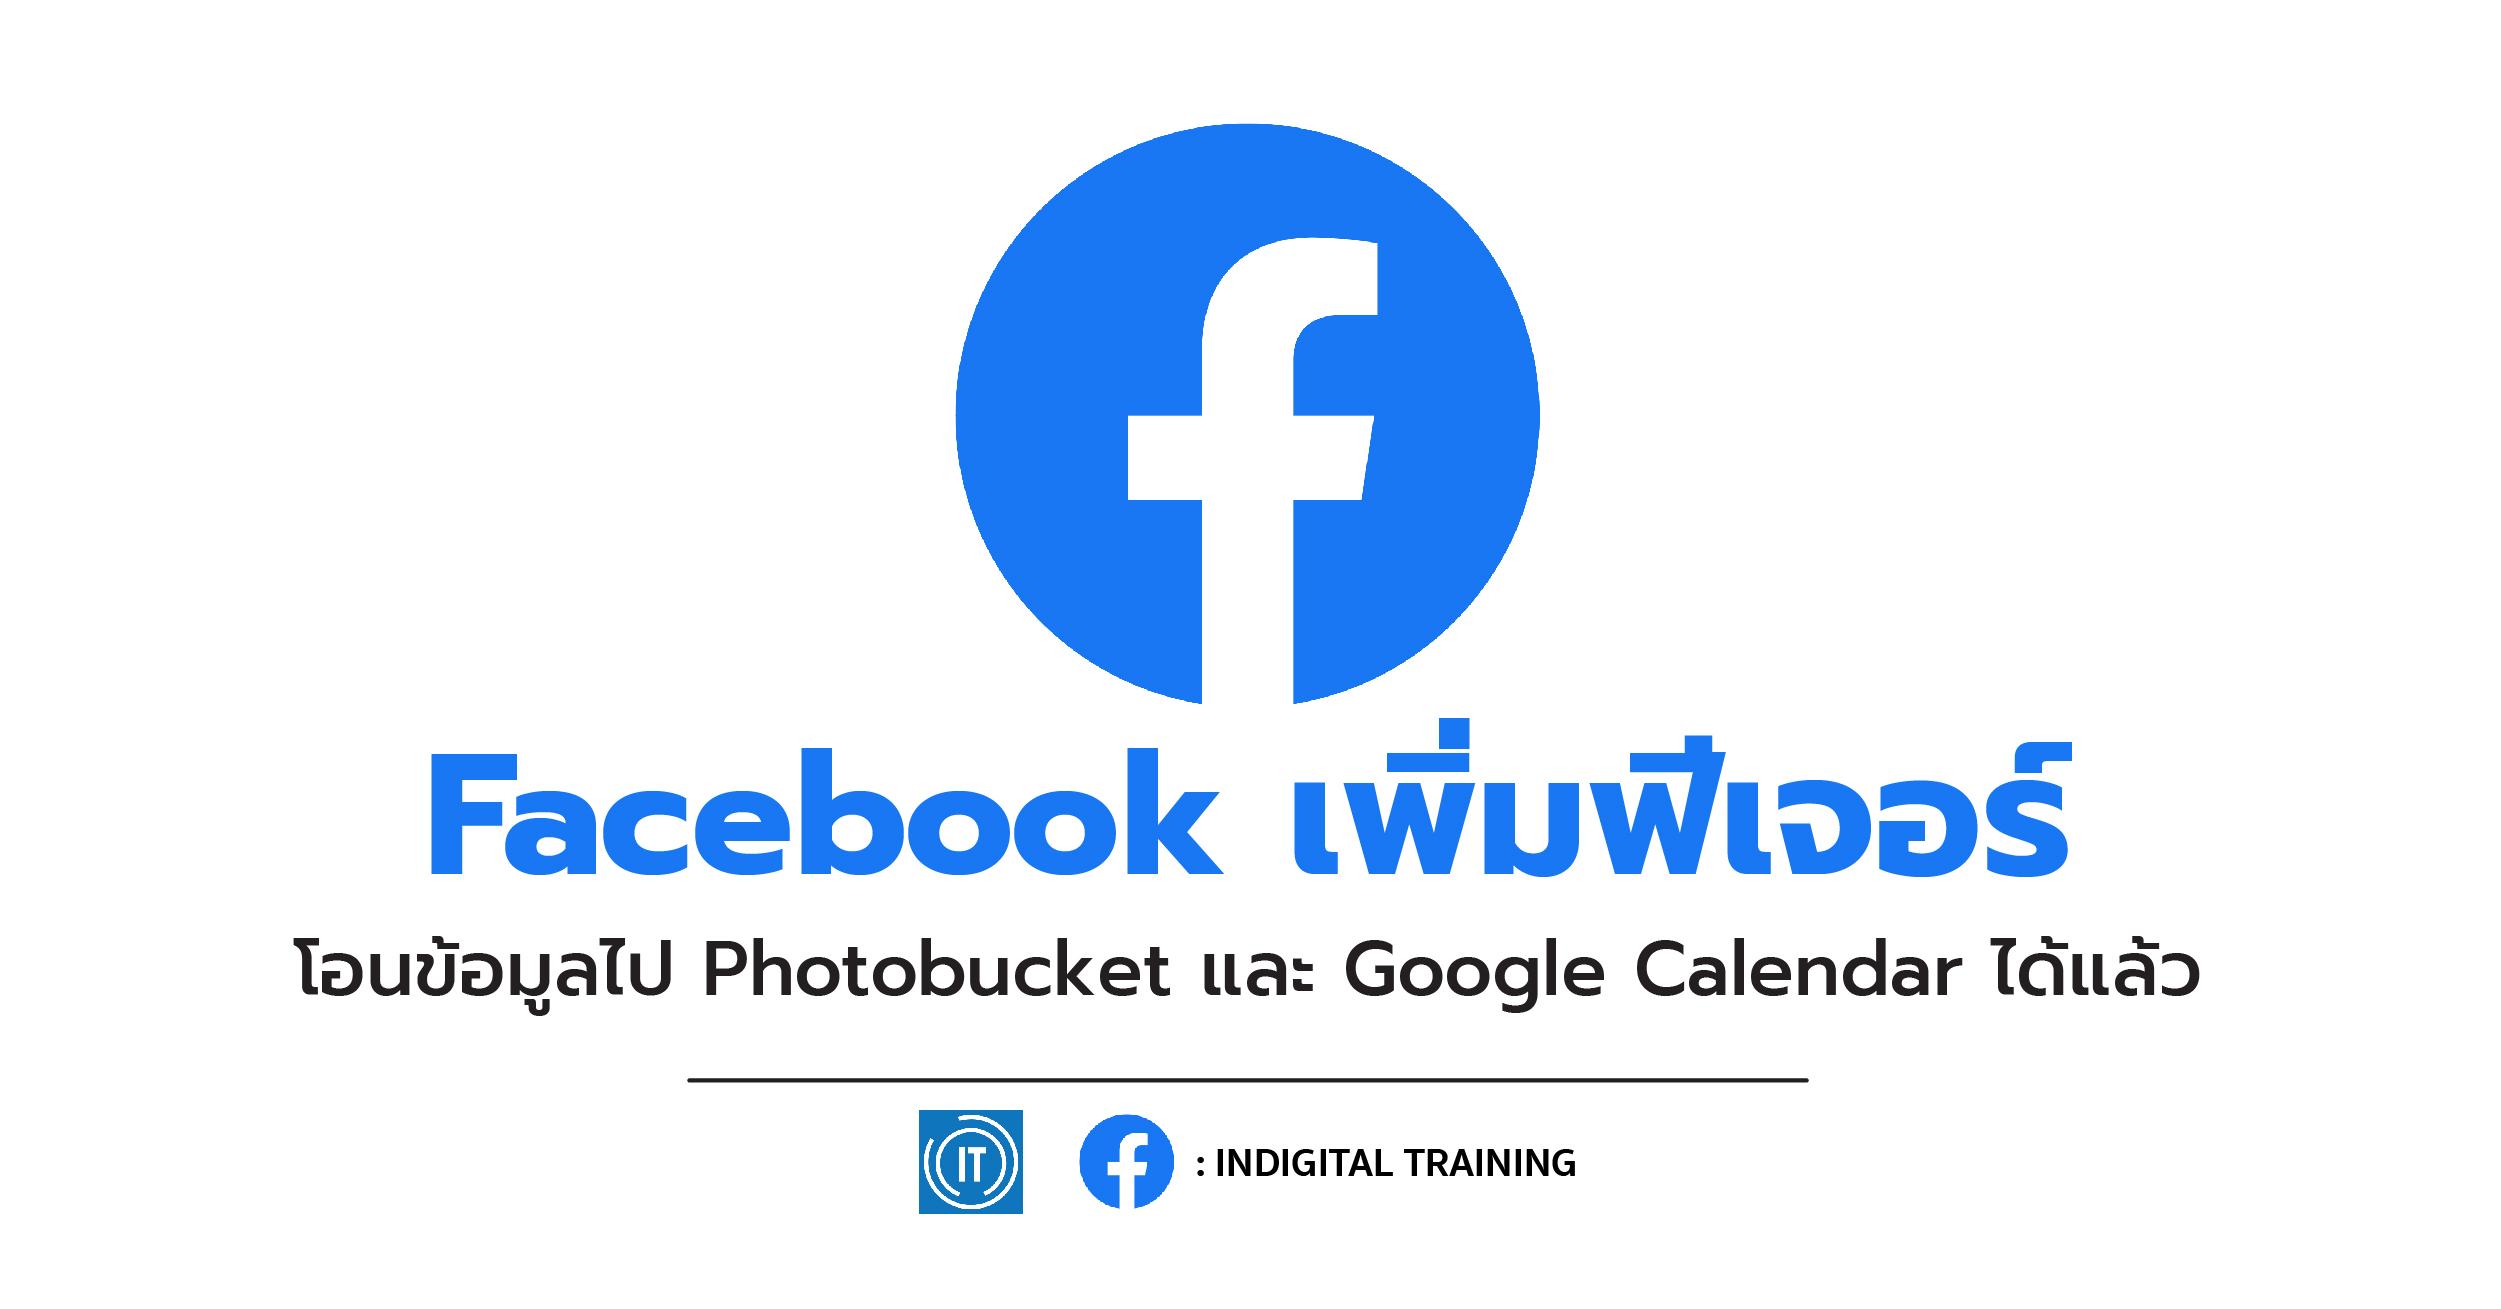 Facebook เพิ่มฟีเจอร์ โอนข้อมูลไป Photobucket และ Google Calendar ได้แล้ว